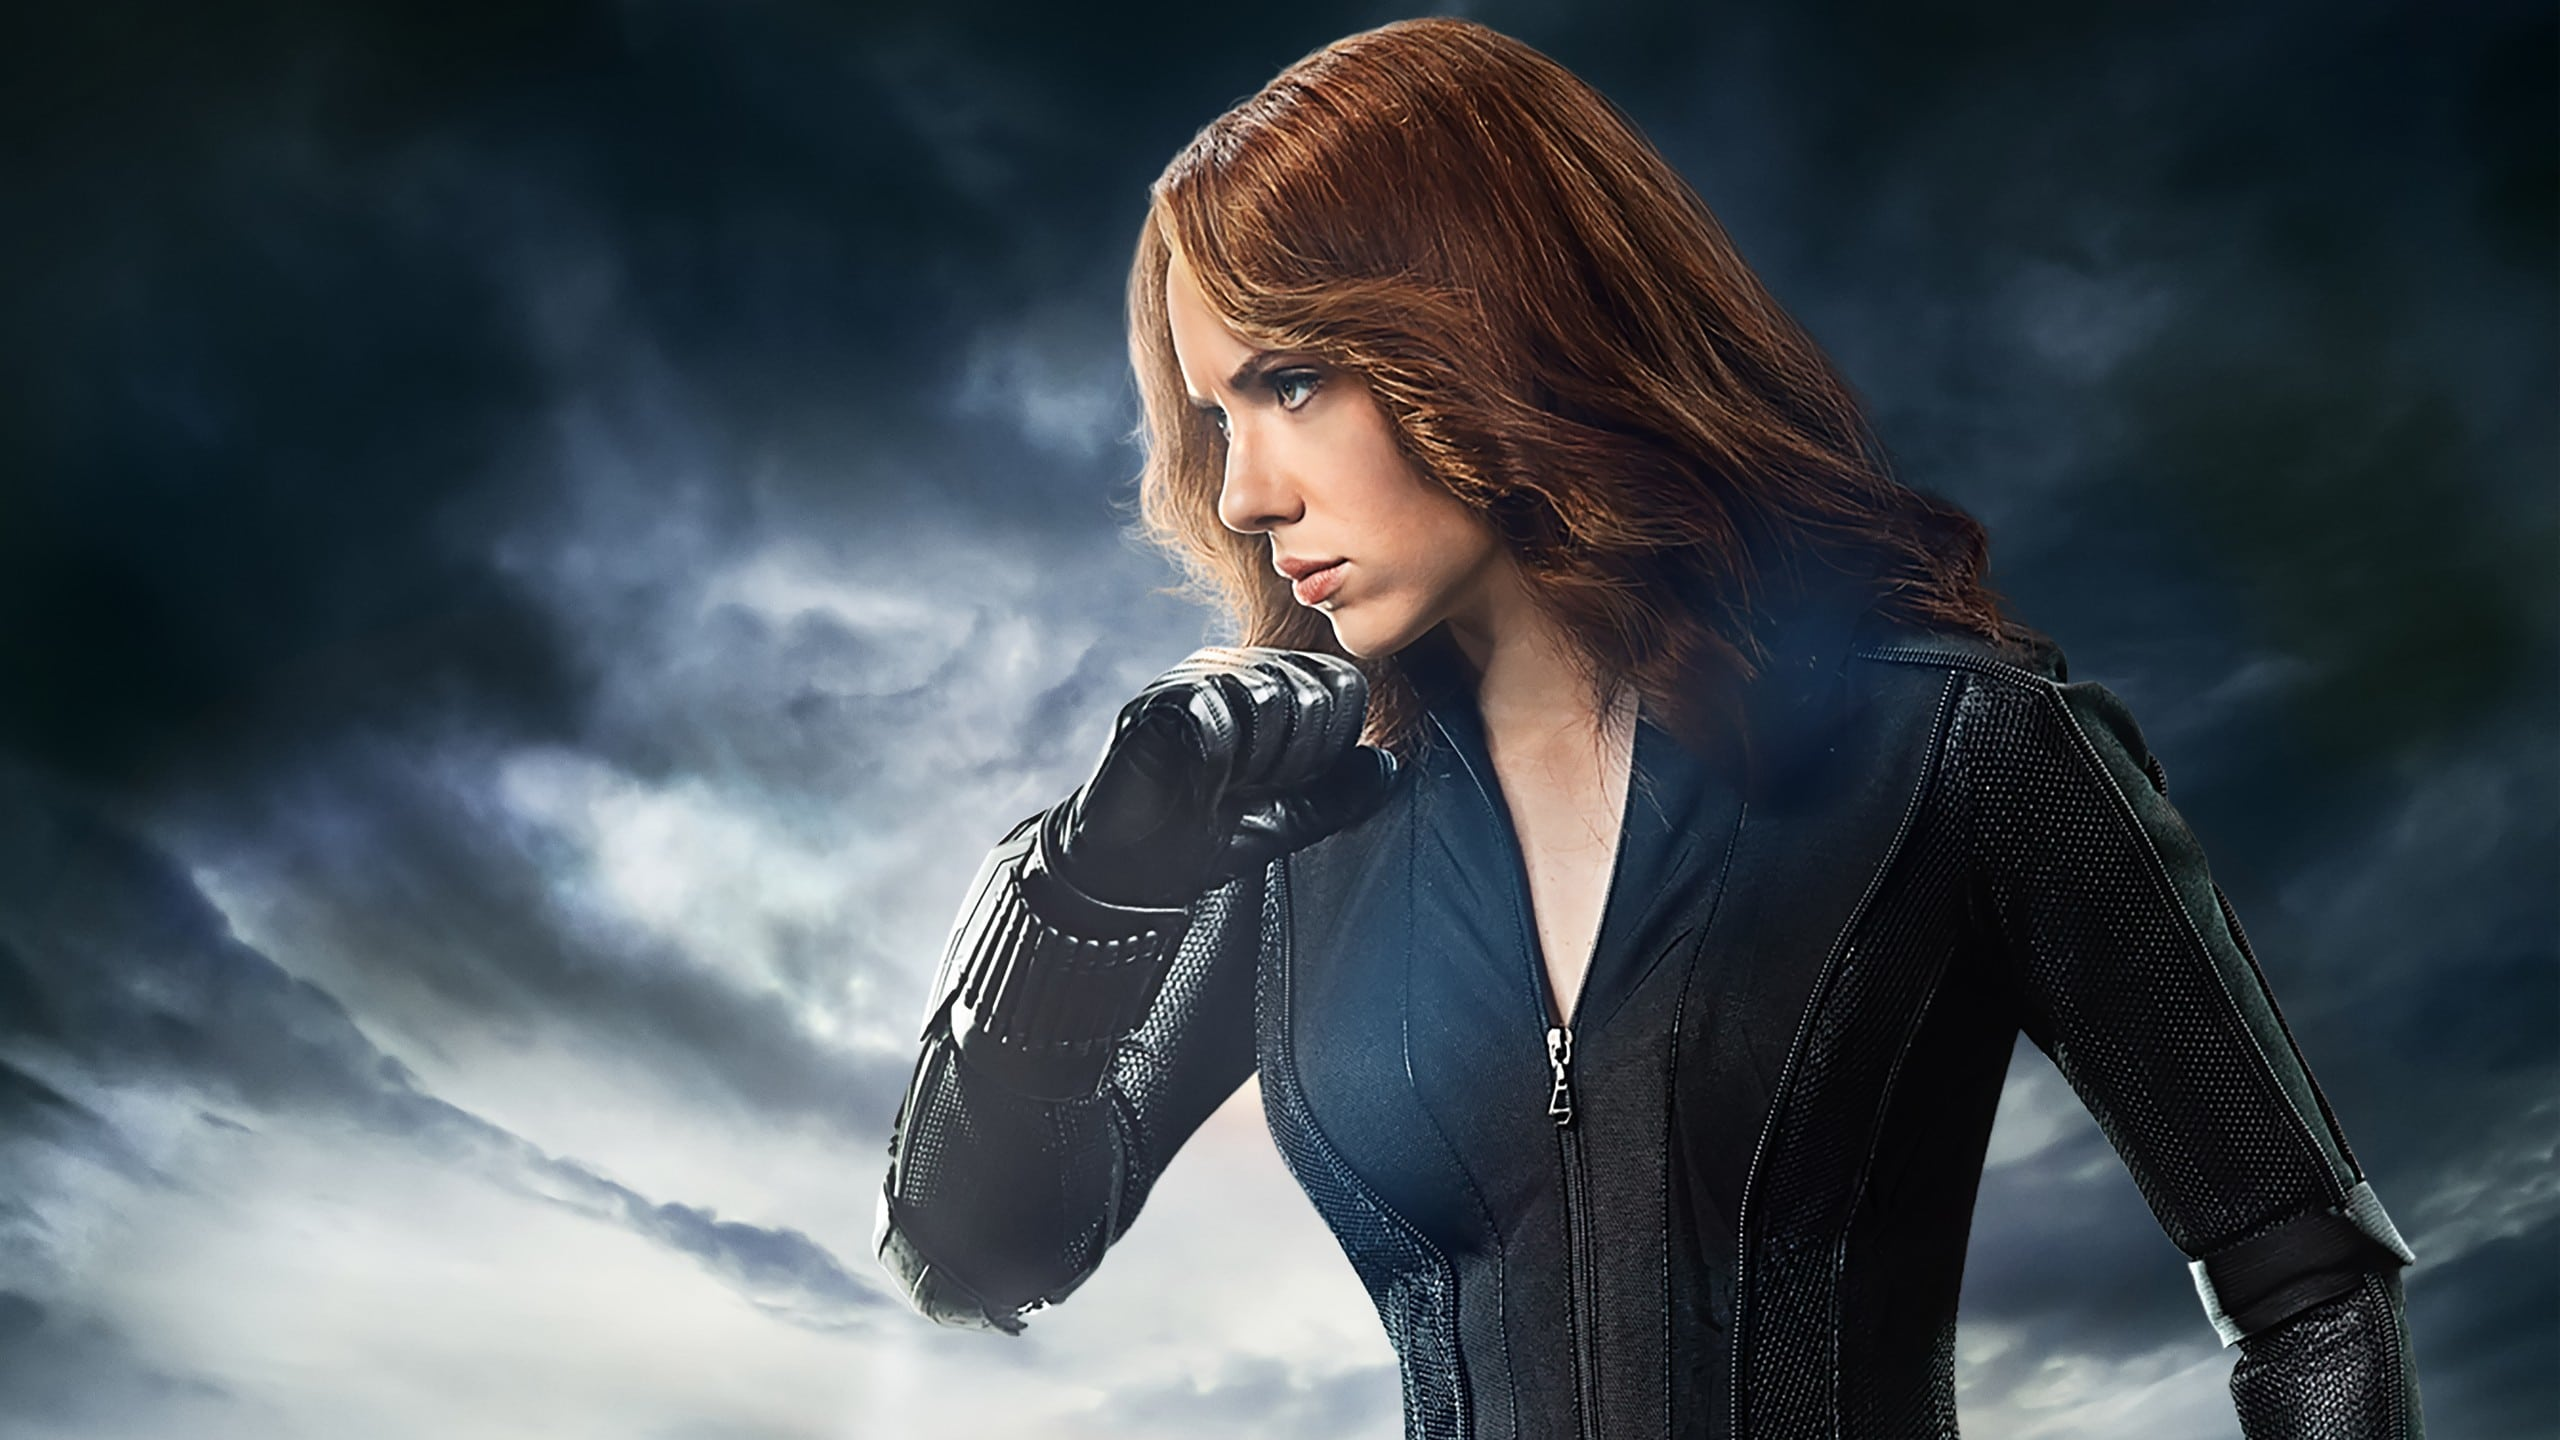 Black Widow Movie Will Explore Captain America Civil War